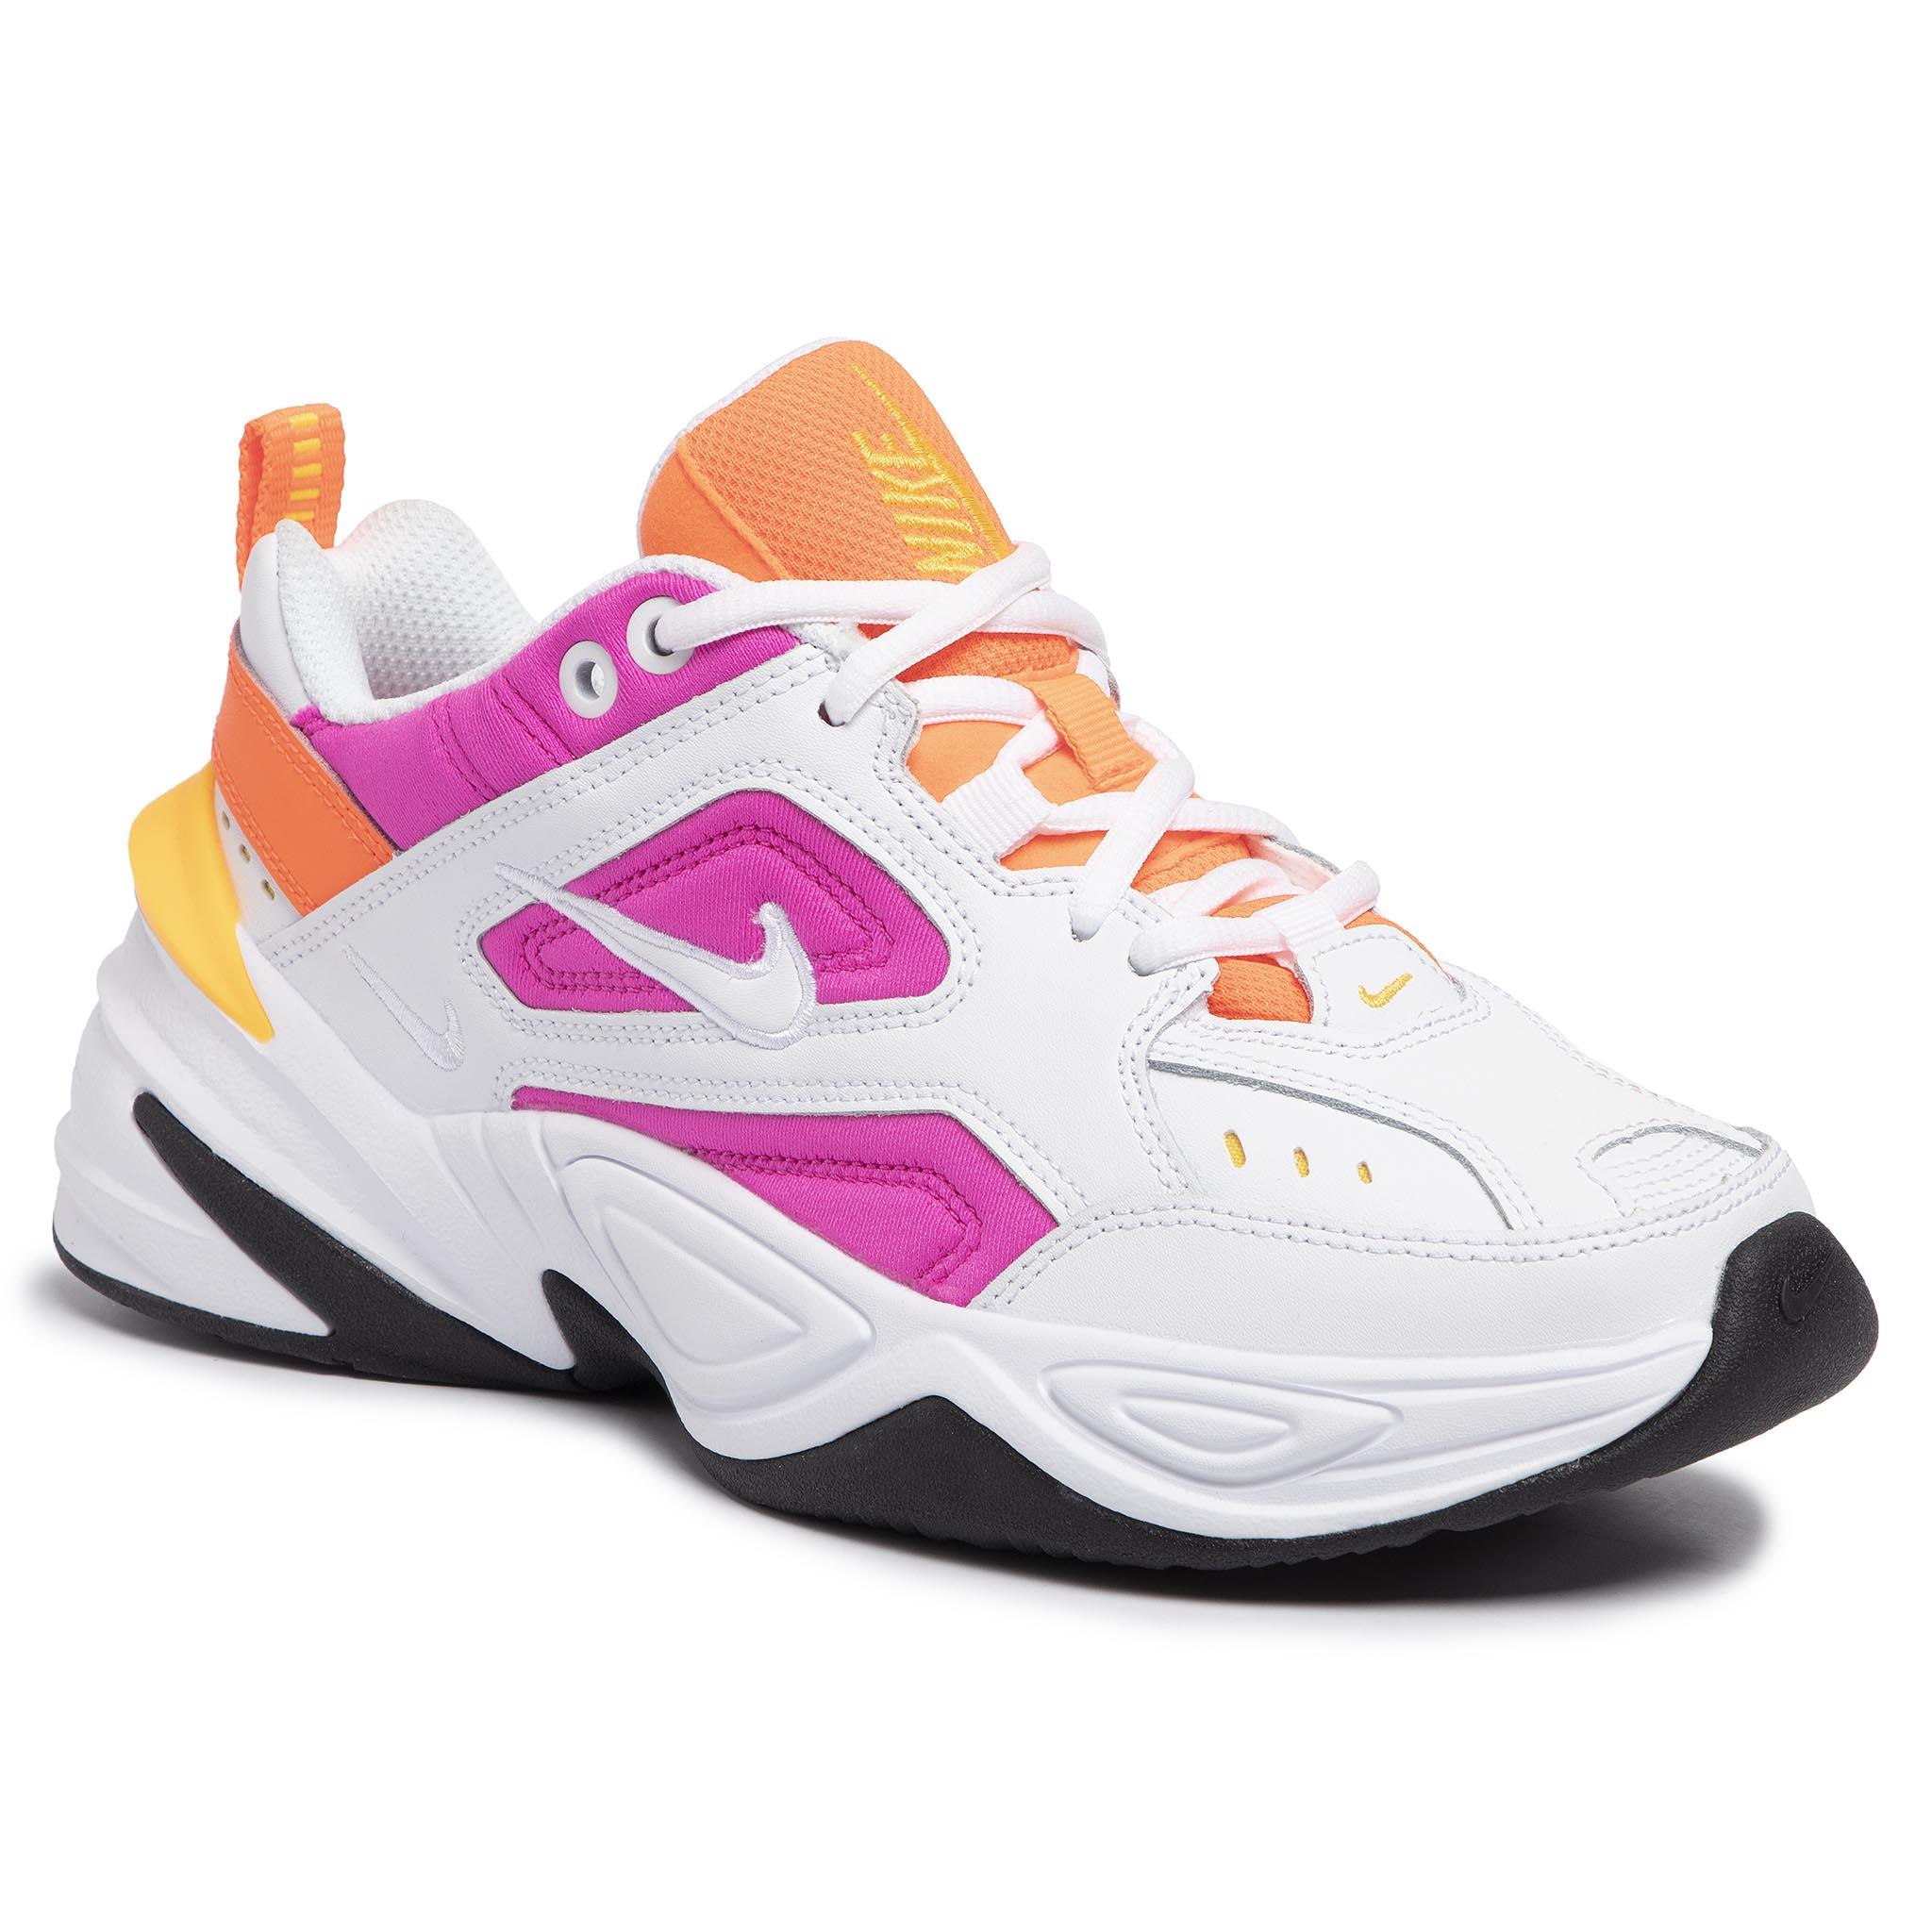 Sneakers TOMMY HILFIGER Velvet Lace Flatform Sneaker FW0FW04311 Midnight CKI